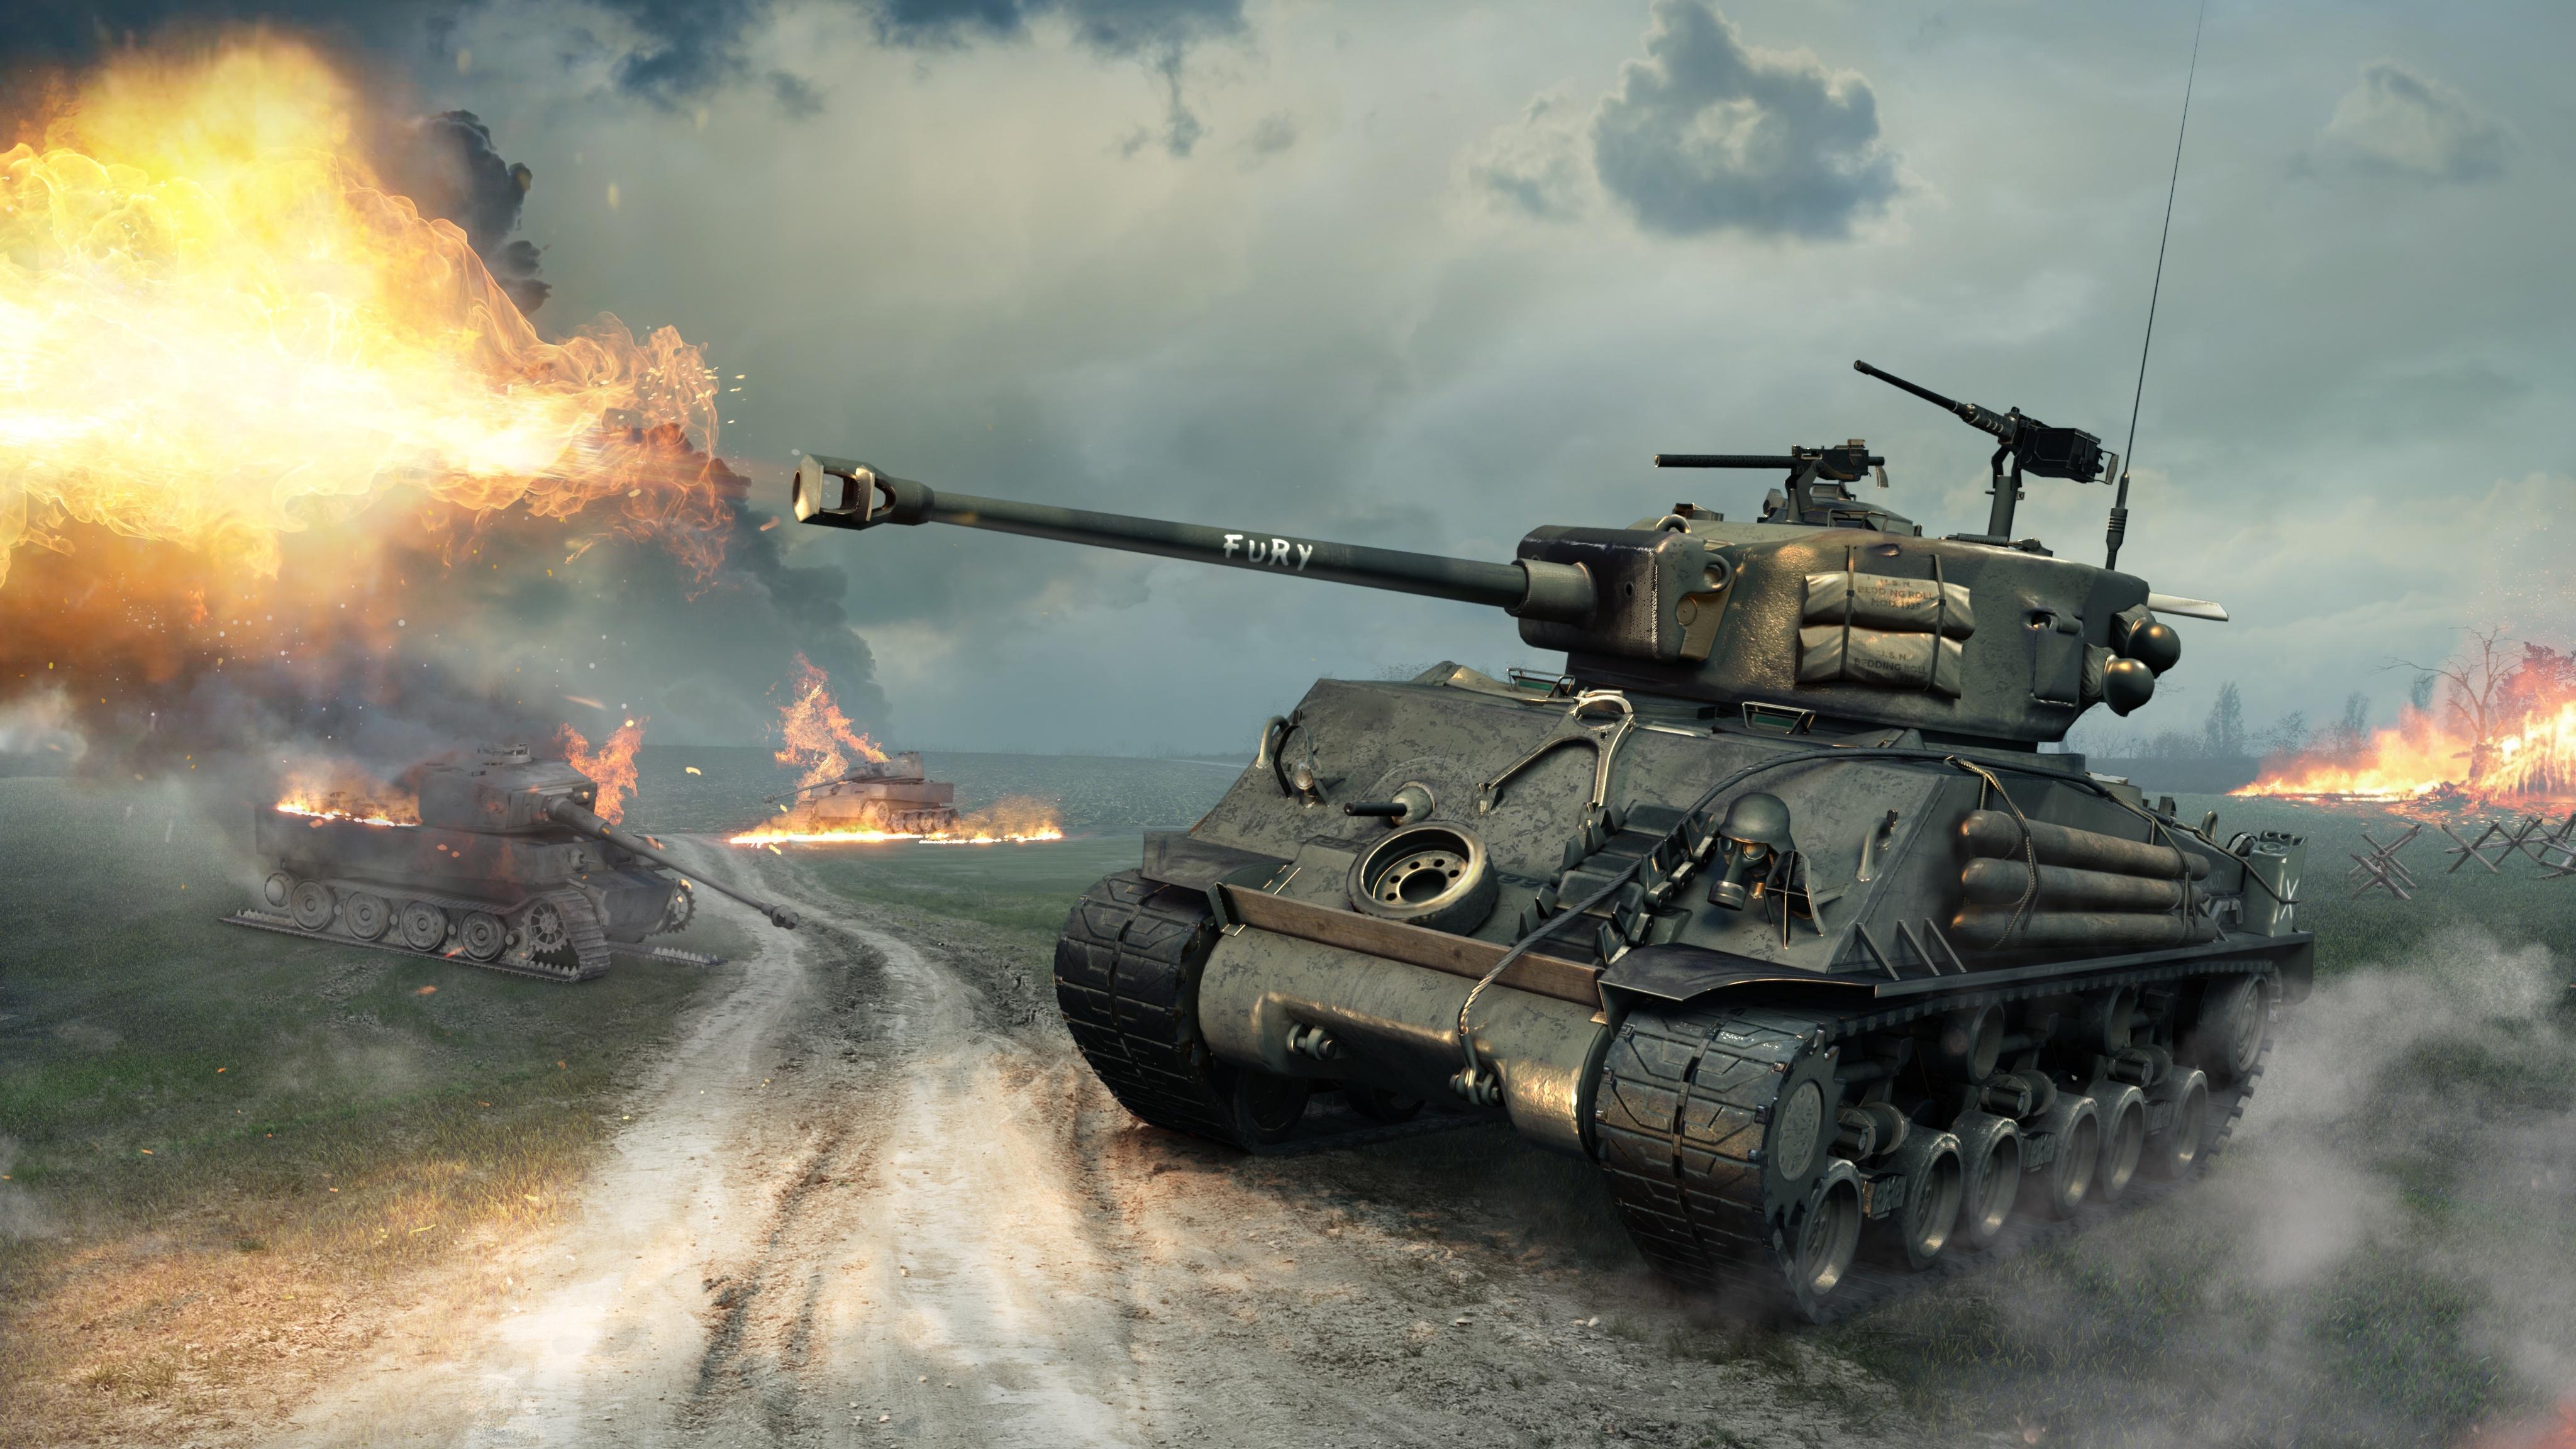 world of tanks firefly игра скачать